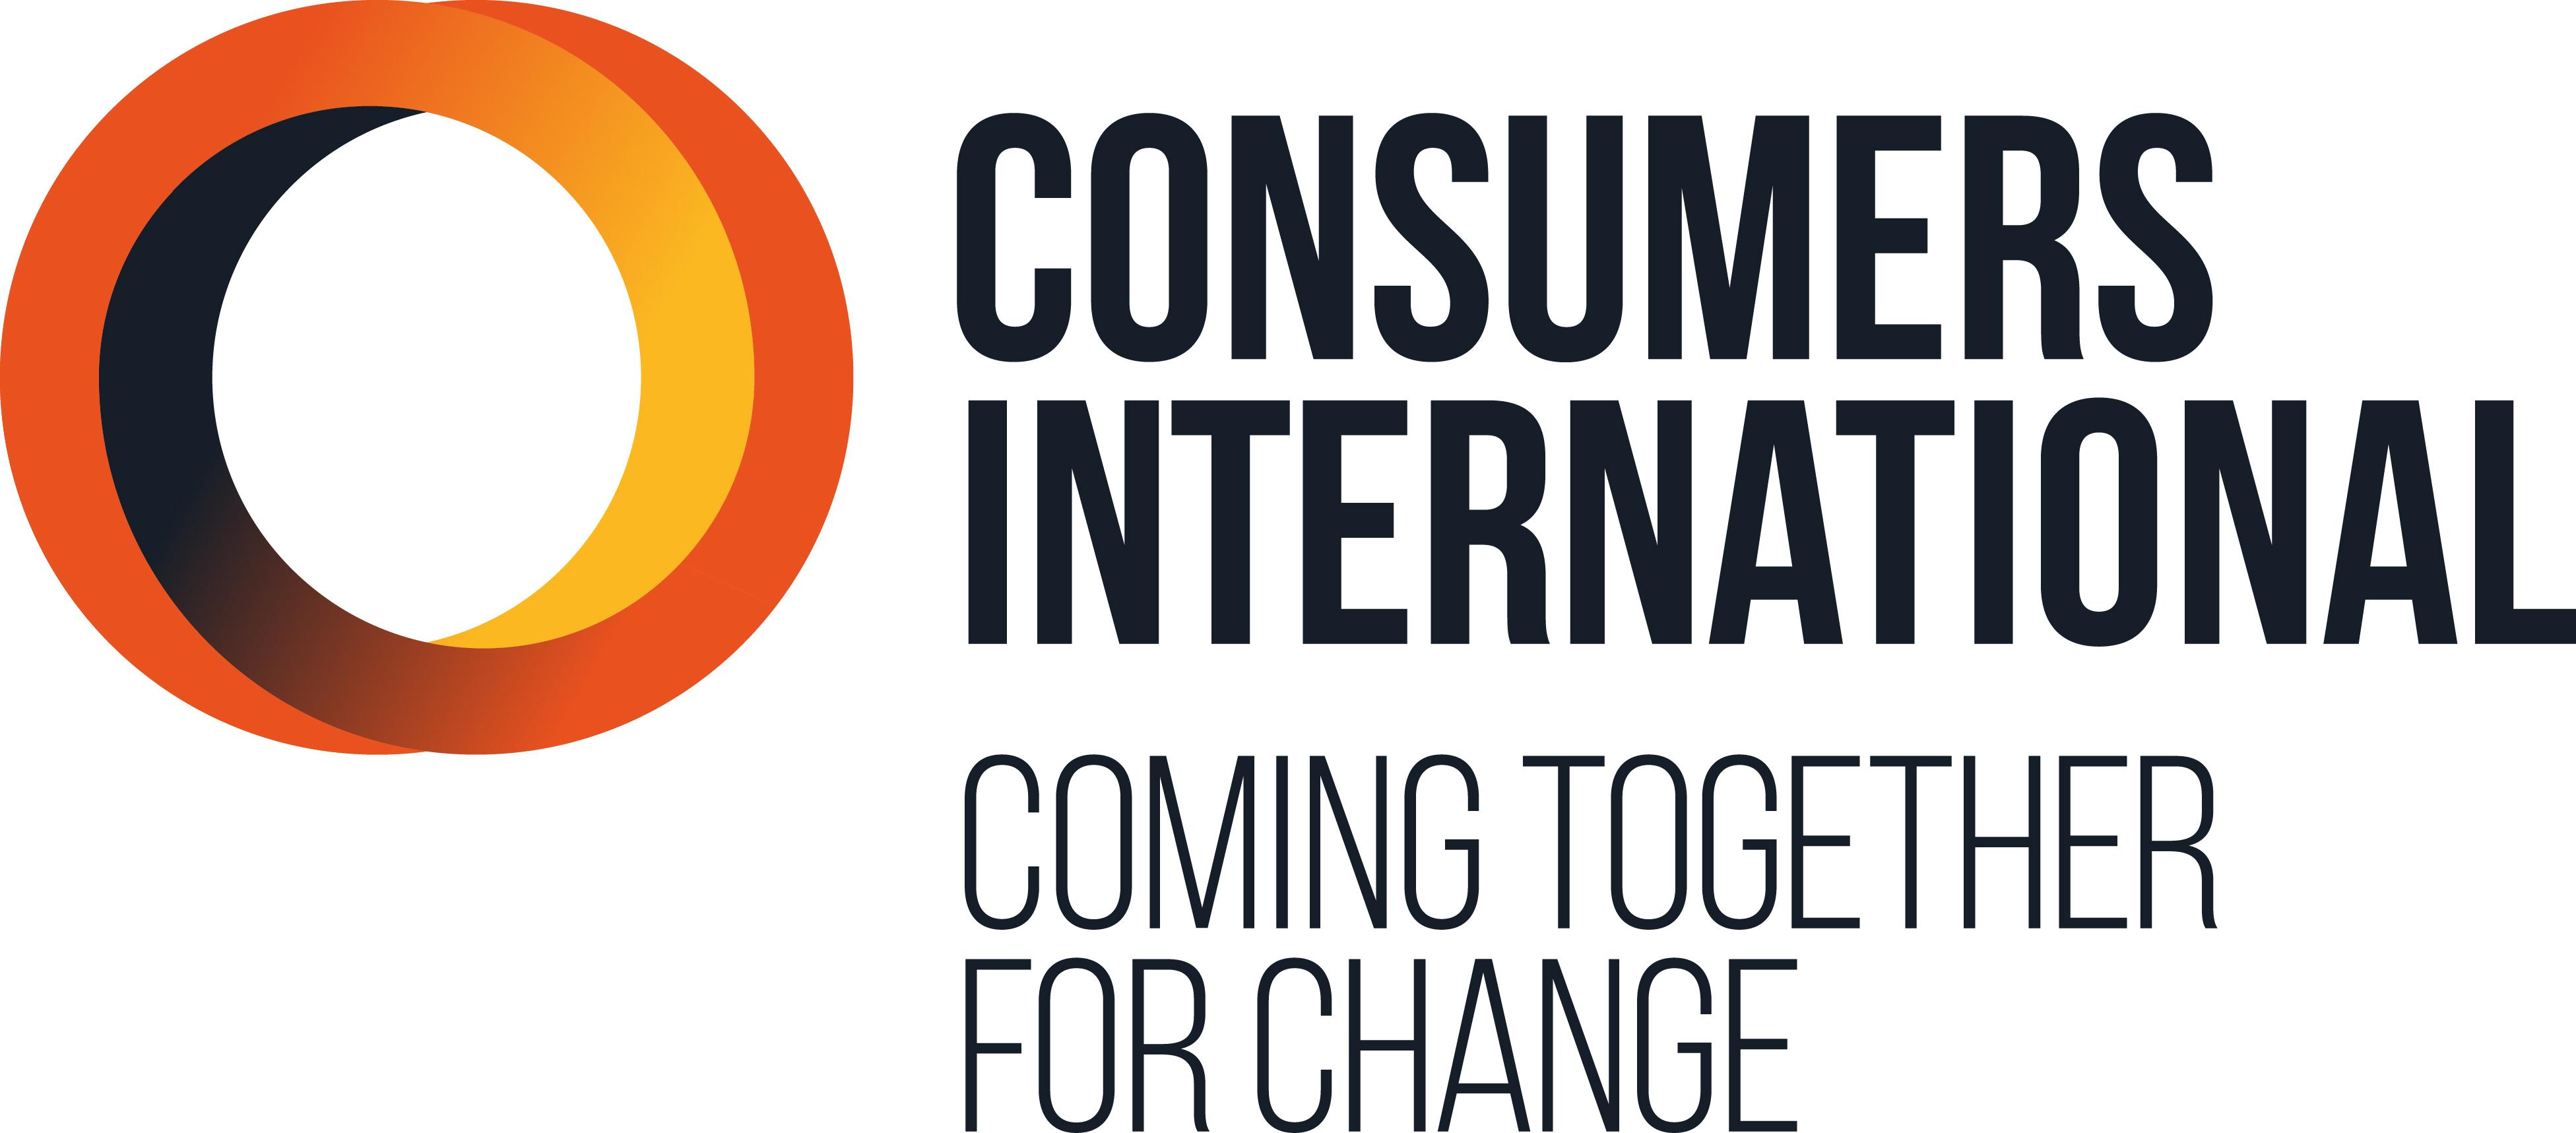 Consumers International - Wikipedia